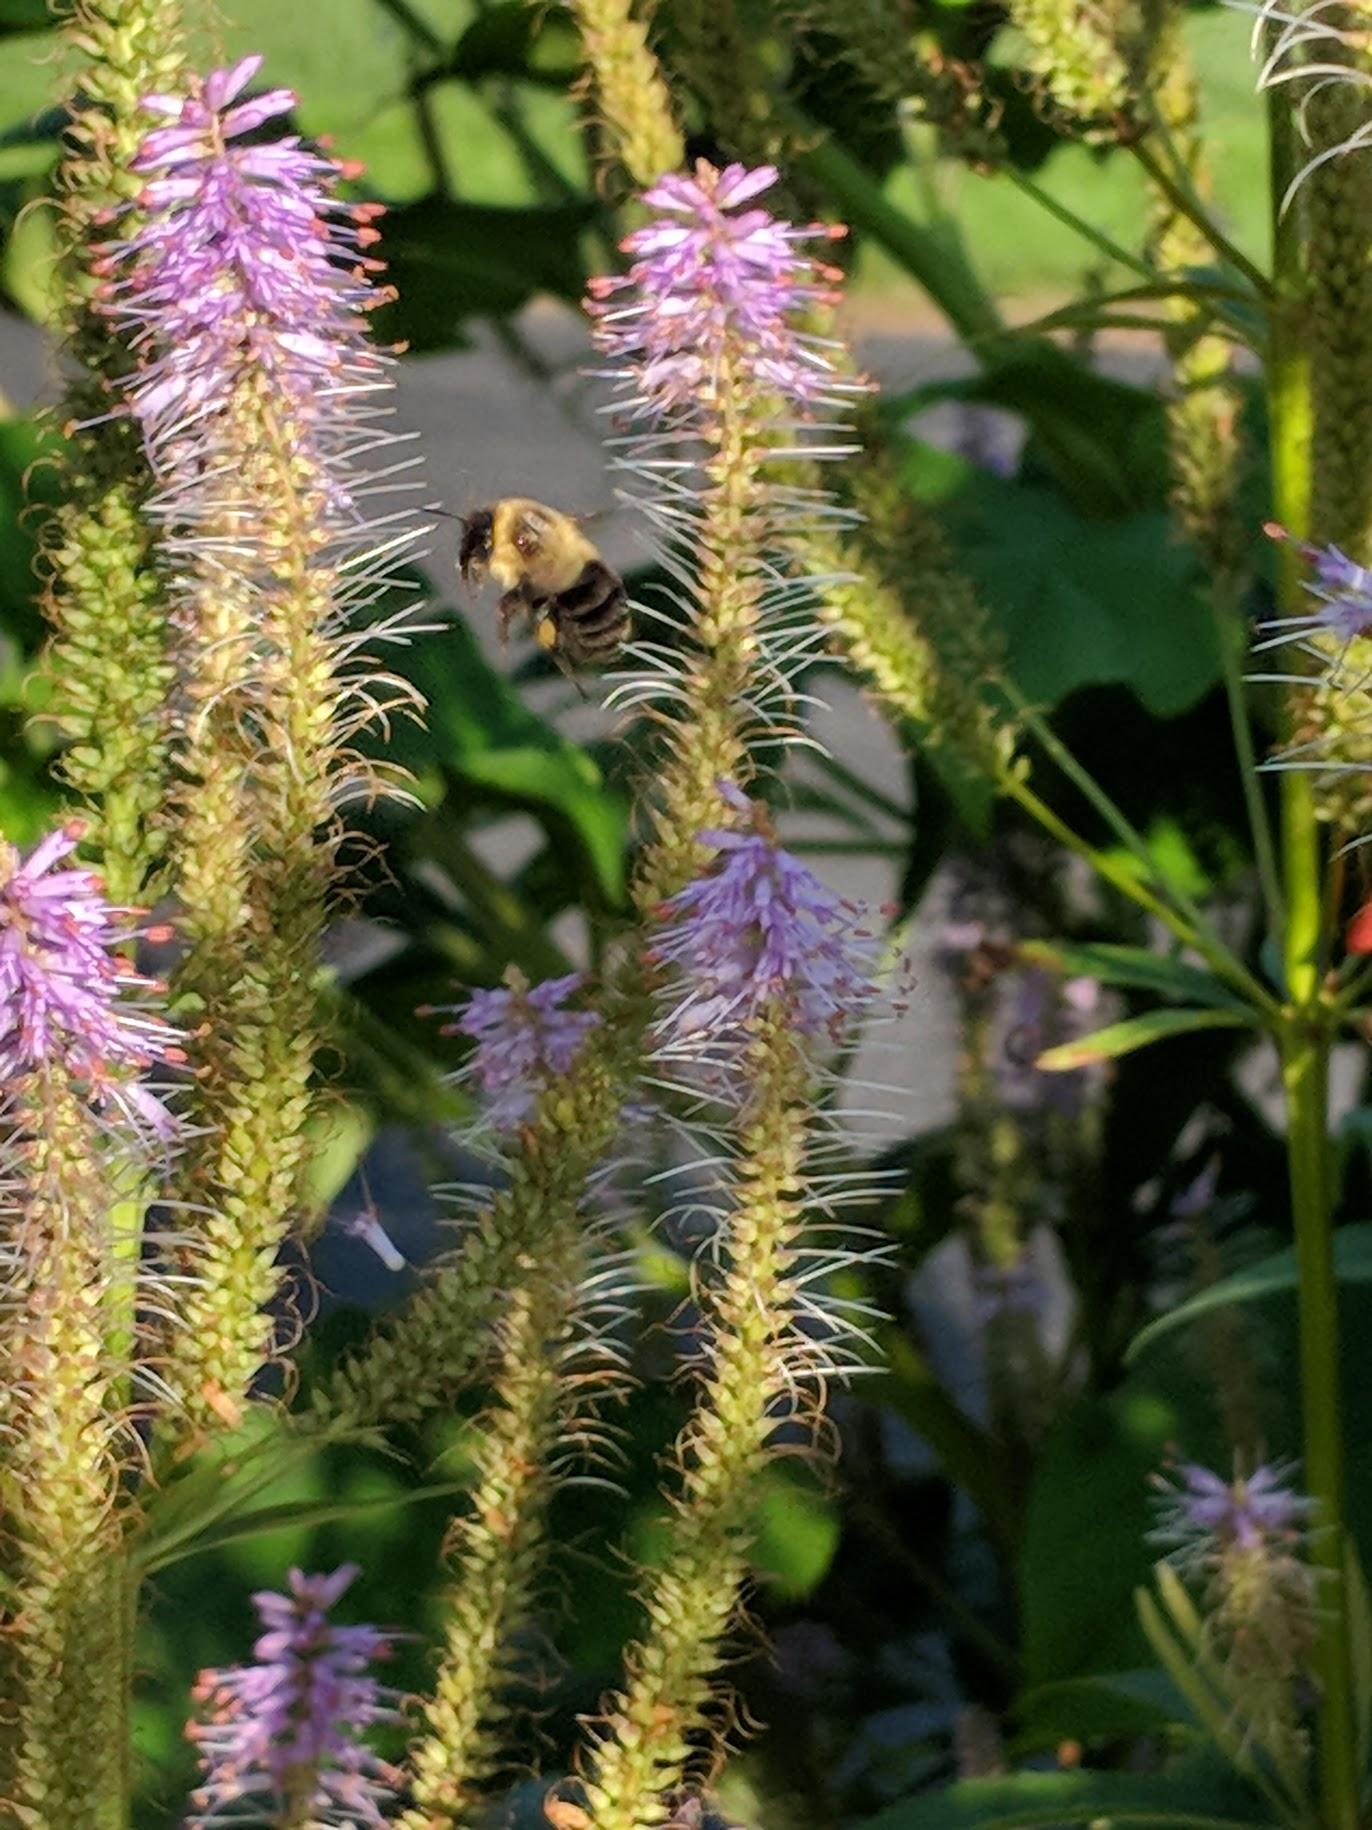 Bumblebee landing on its favorite plant!